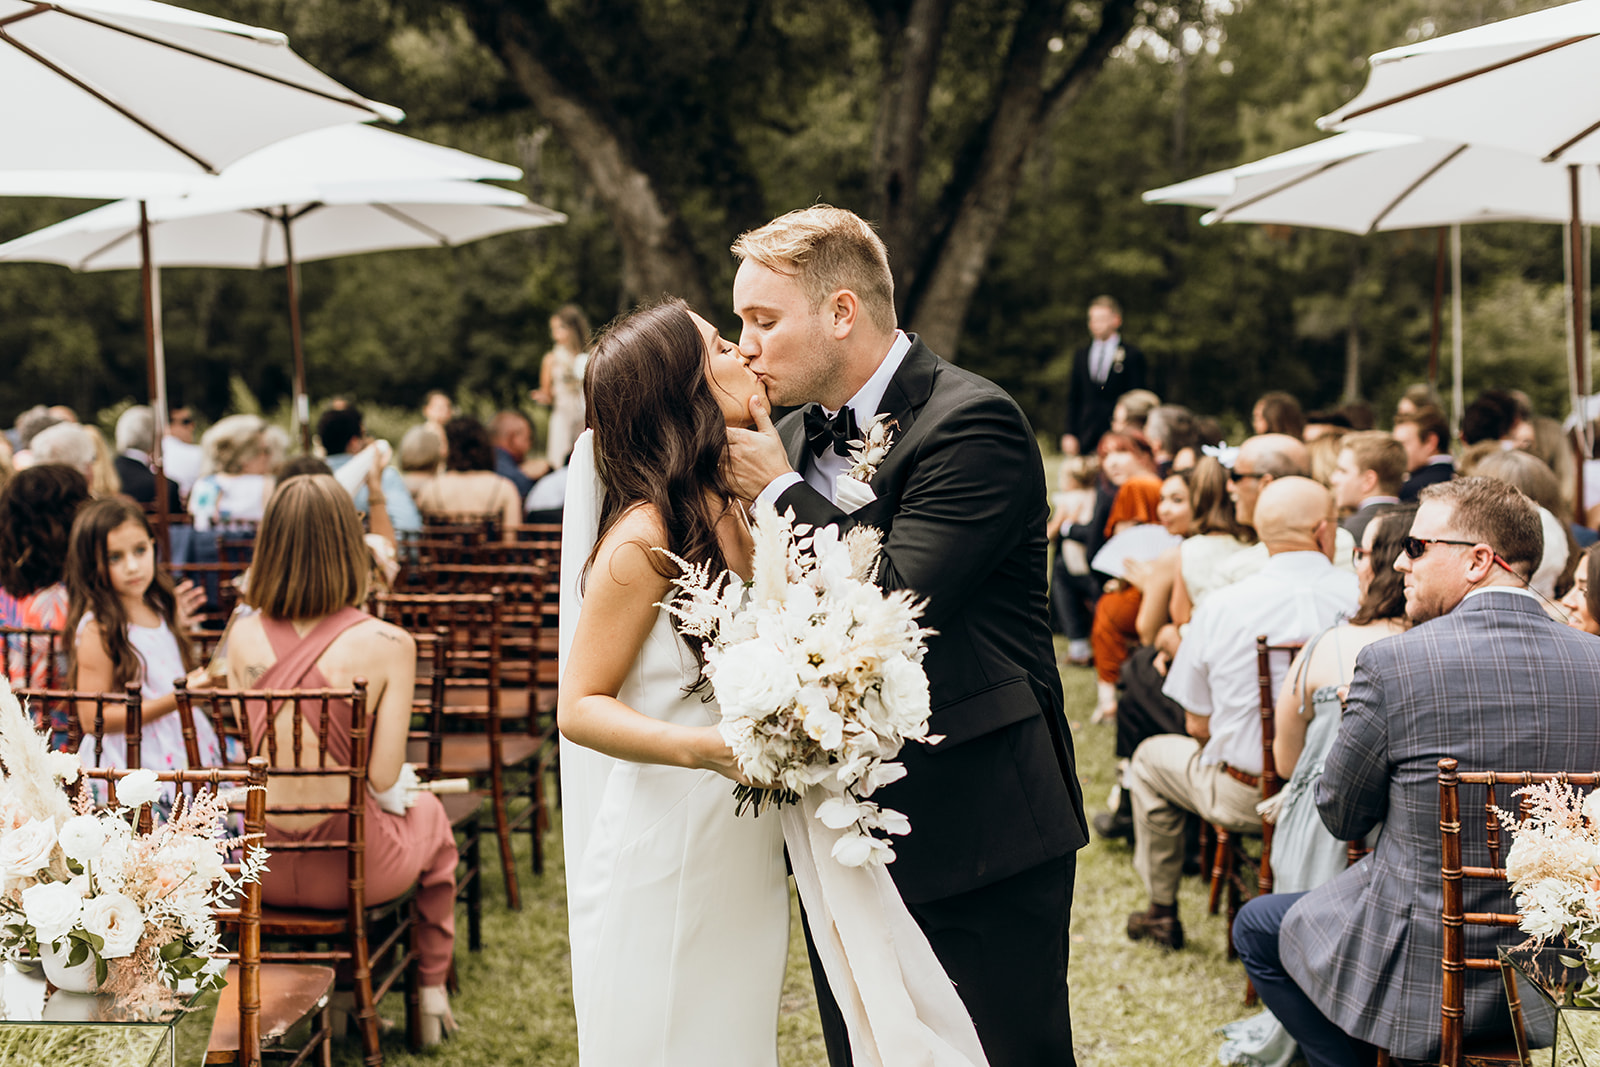 Casey-Josh-Pearl-In-The-Wild-Tallahassee-Wedding-135_websize.jpg